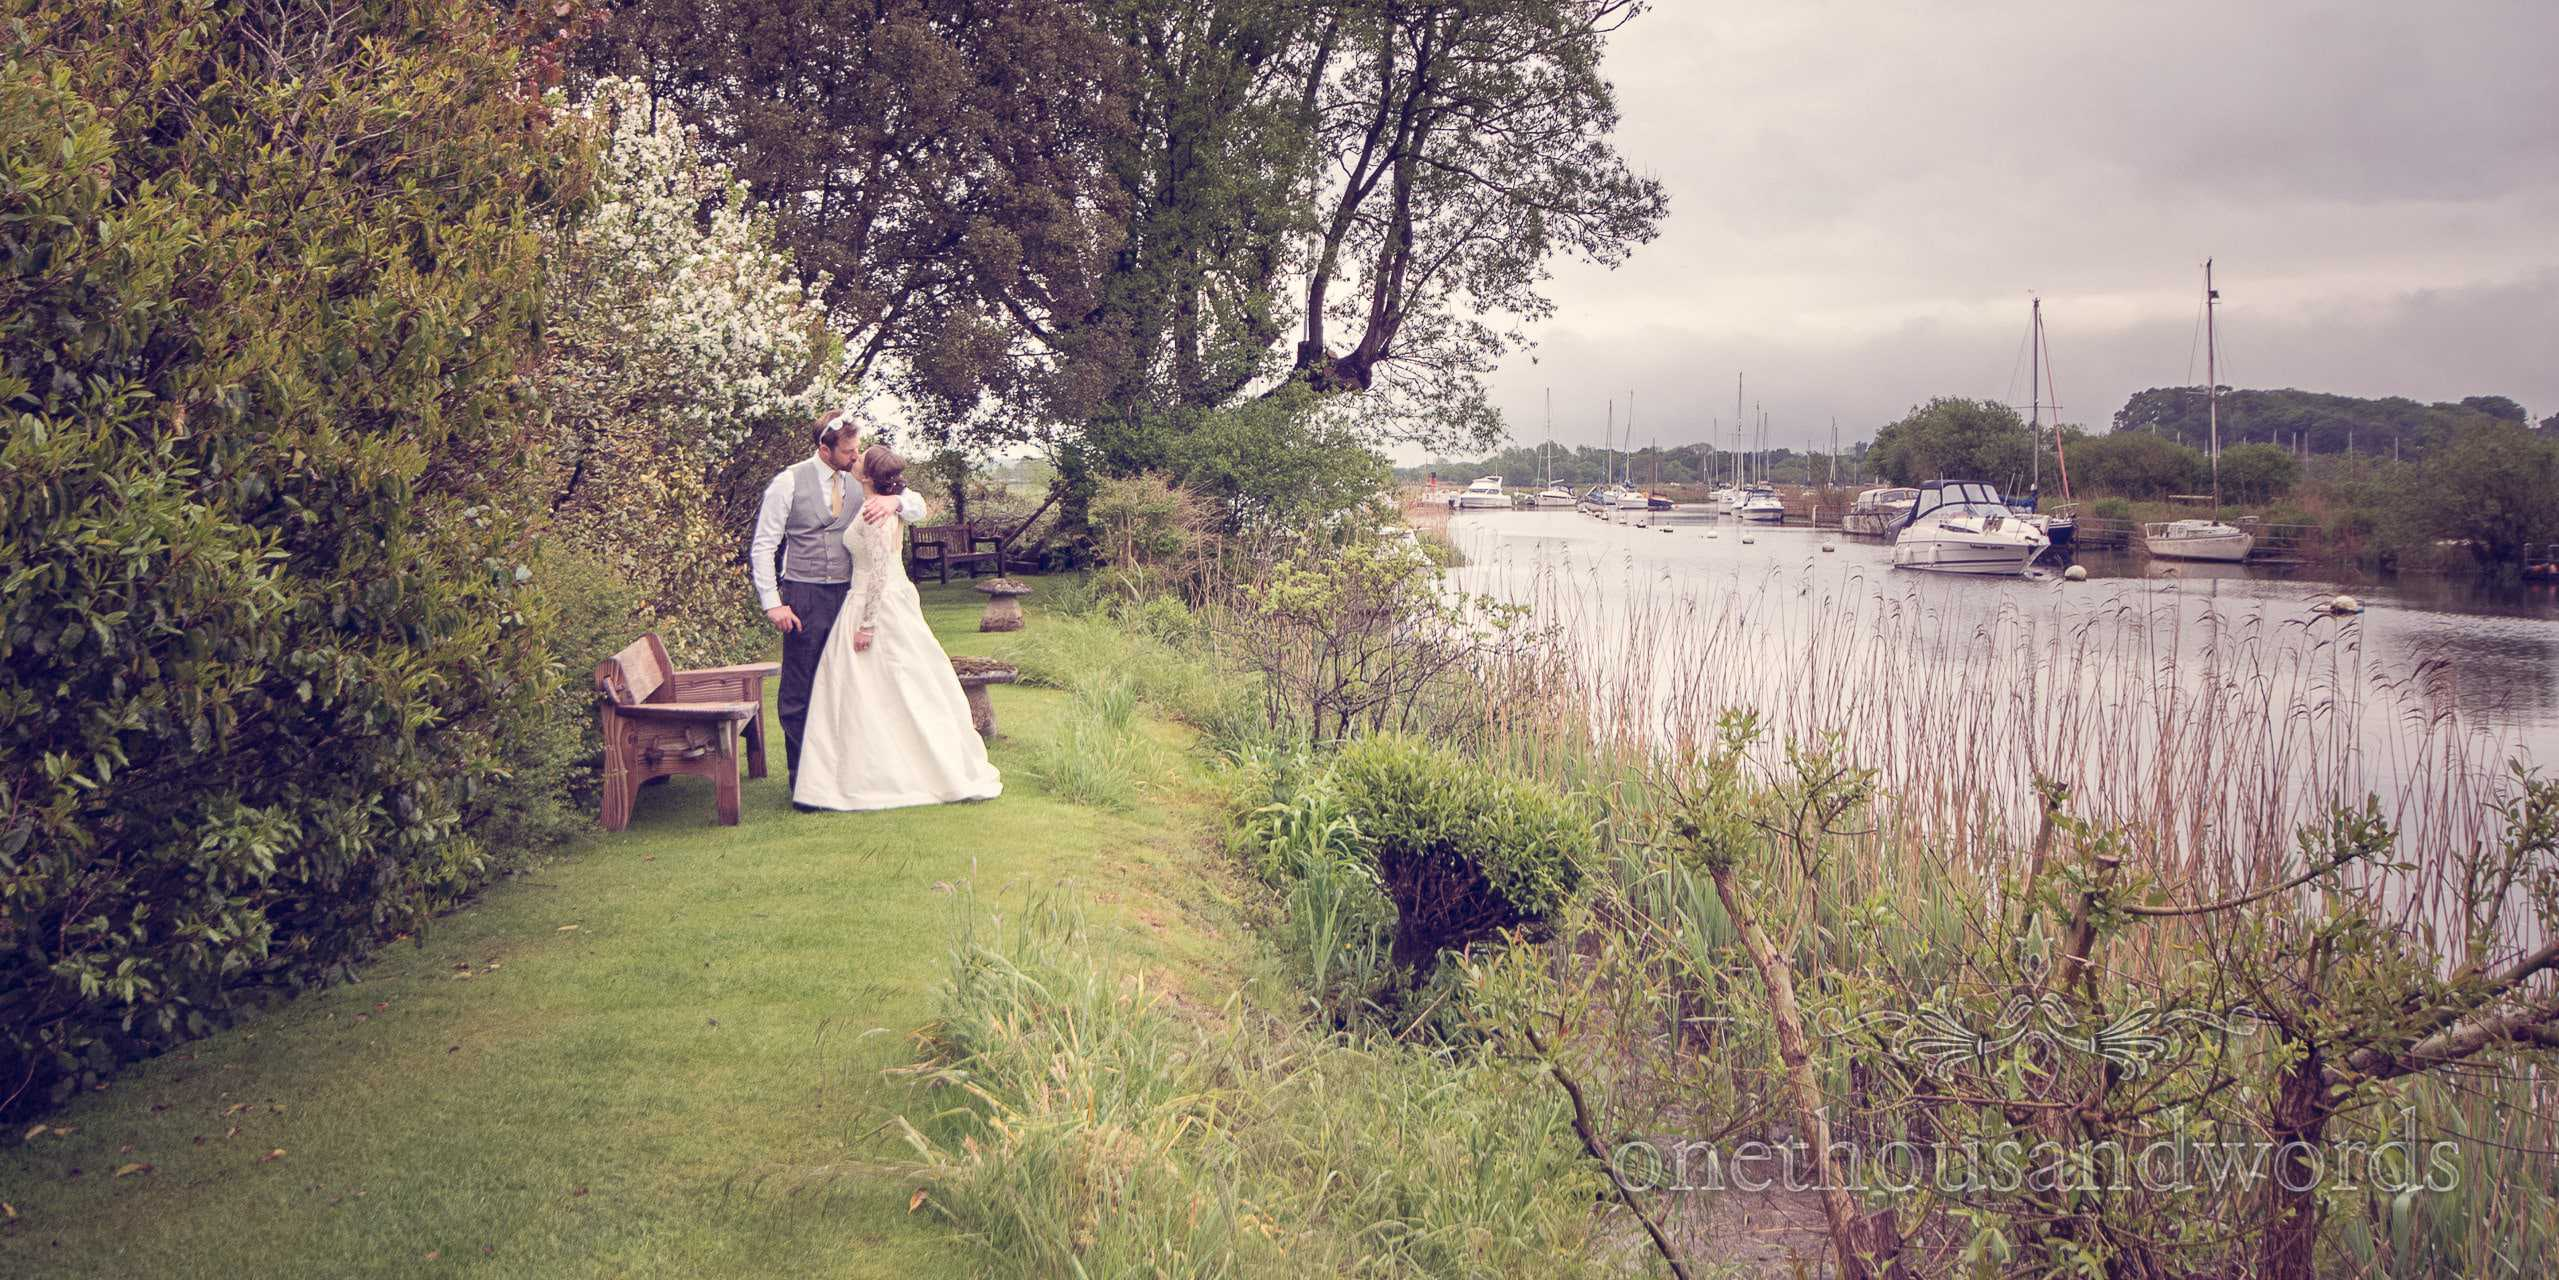 Bride and Groom next to Wareham River at The Priory Wareham wedding